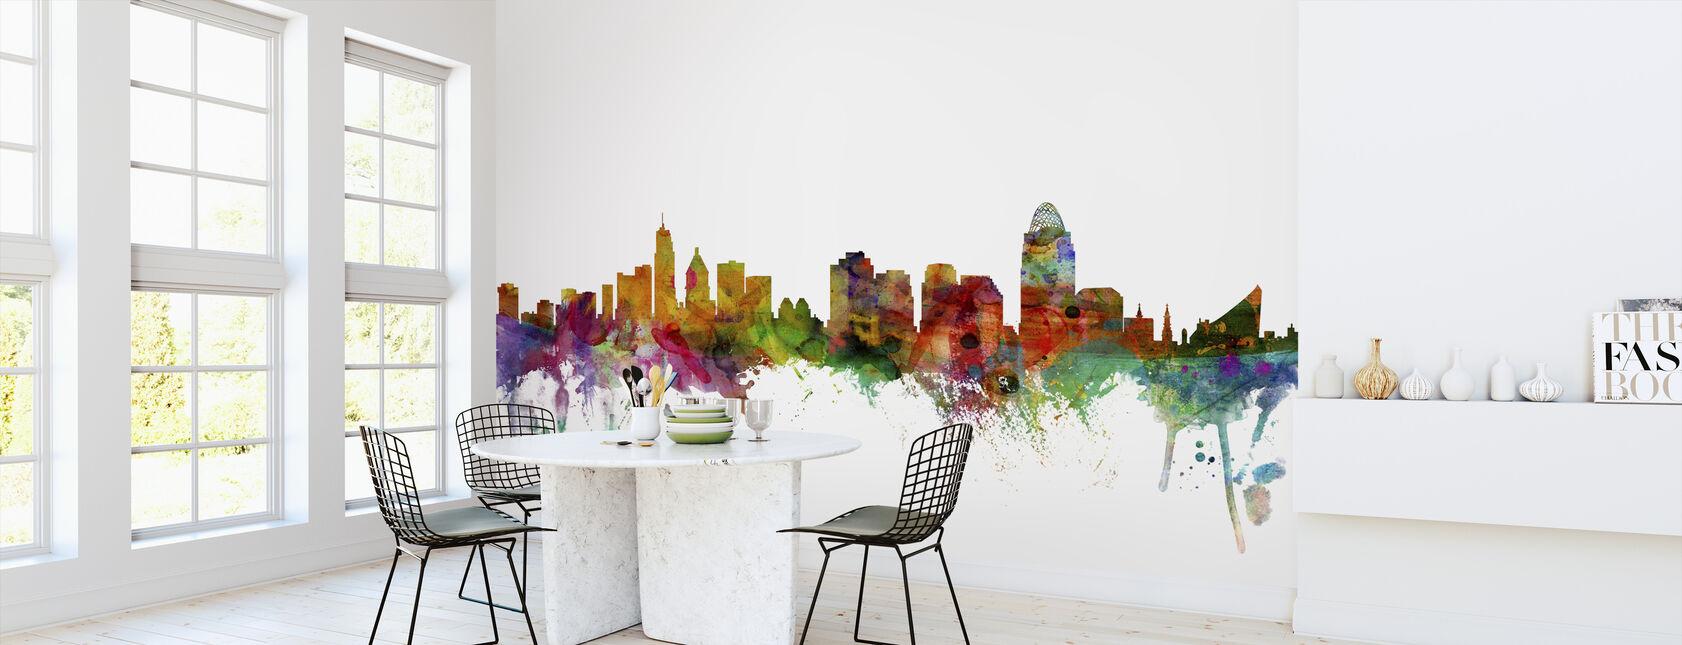 Cincinnati Ohio Skyline - Tapet - Kjøkken